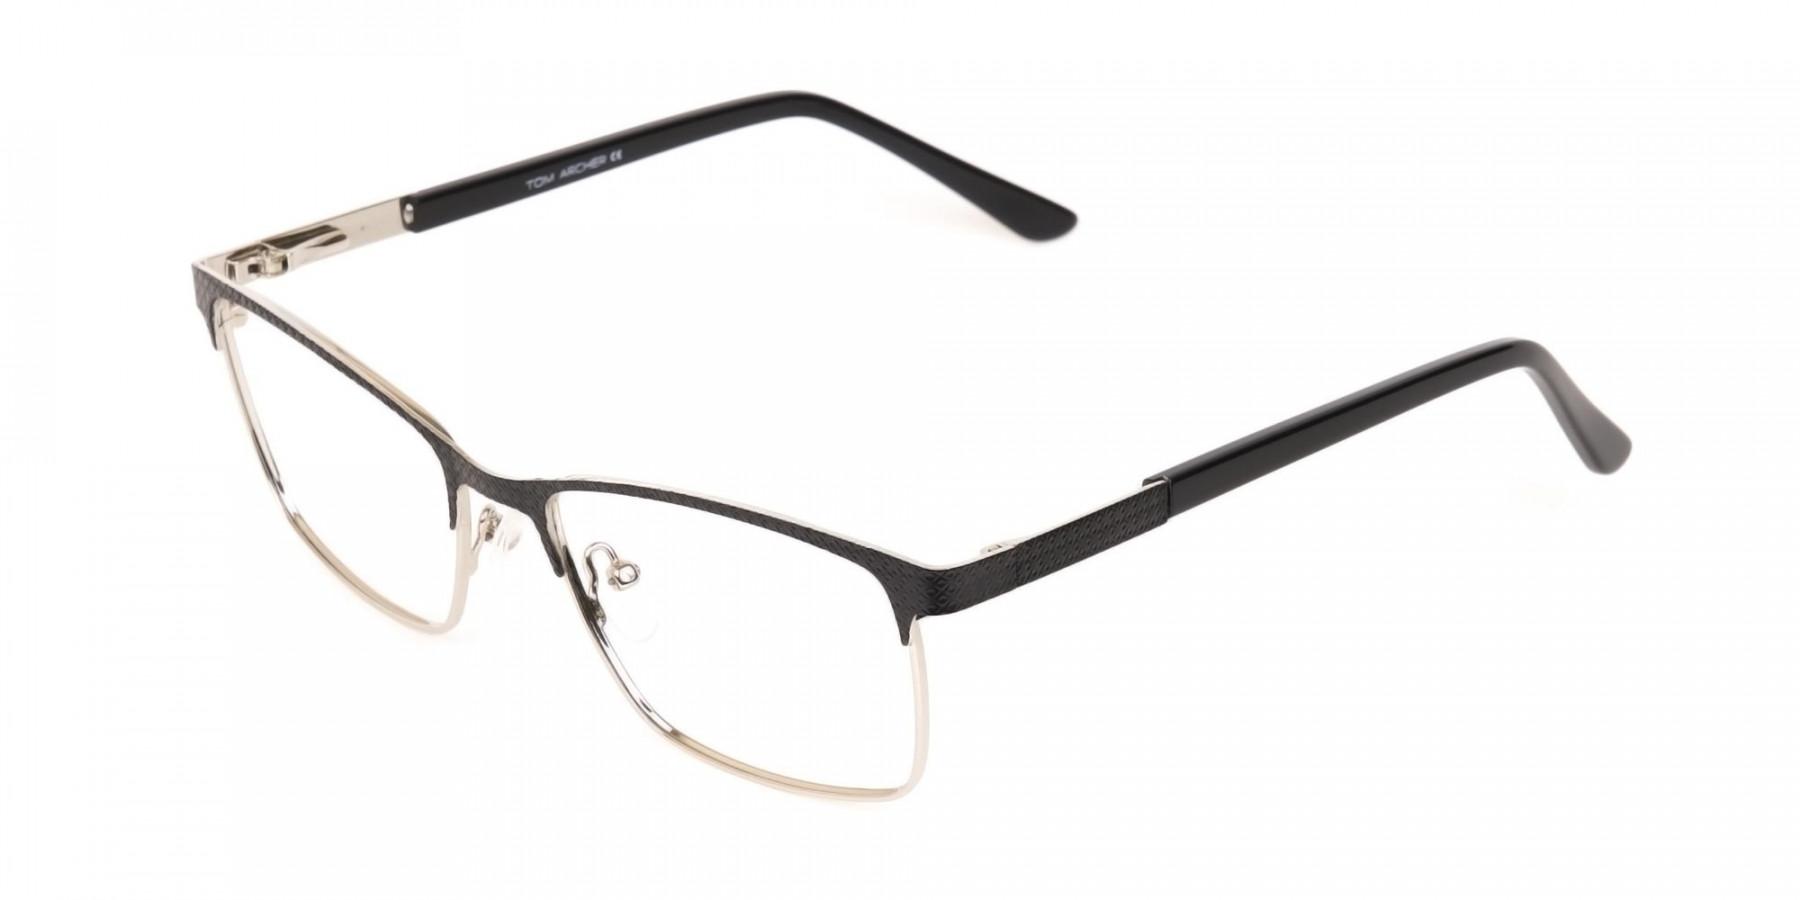 Black Silver Metal Rectangular Glasses Frame-1